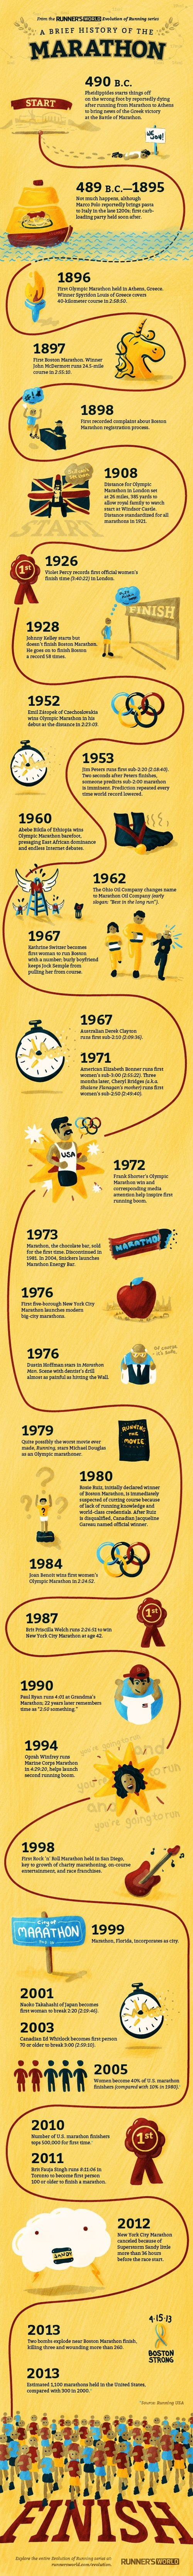 A Brief History of the Marathon